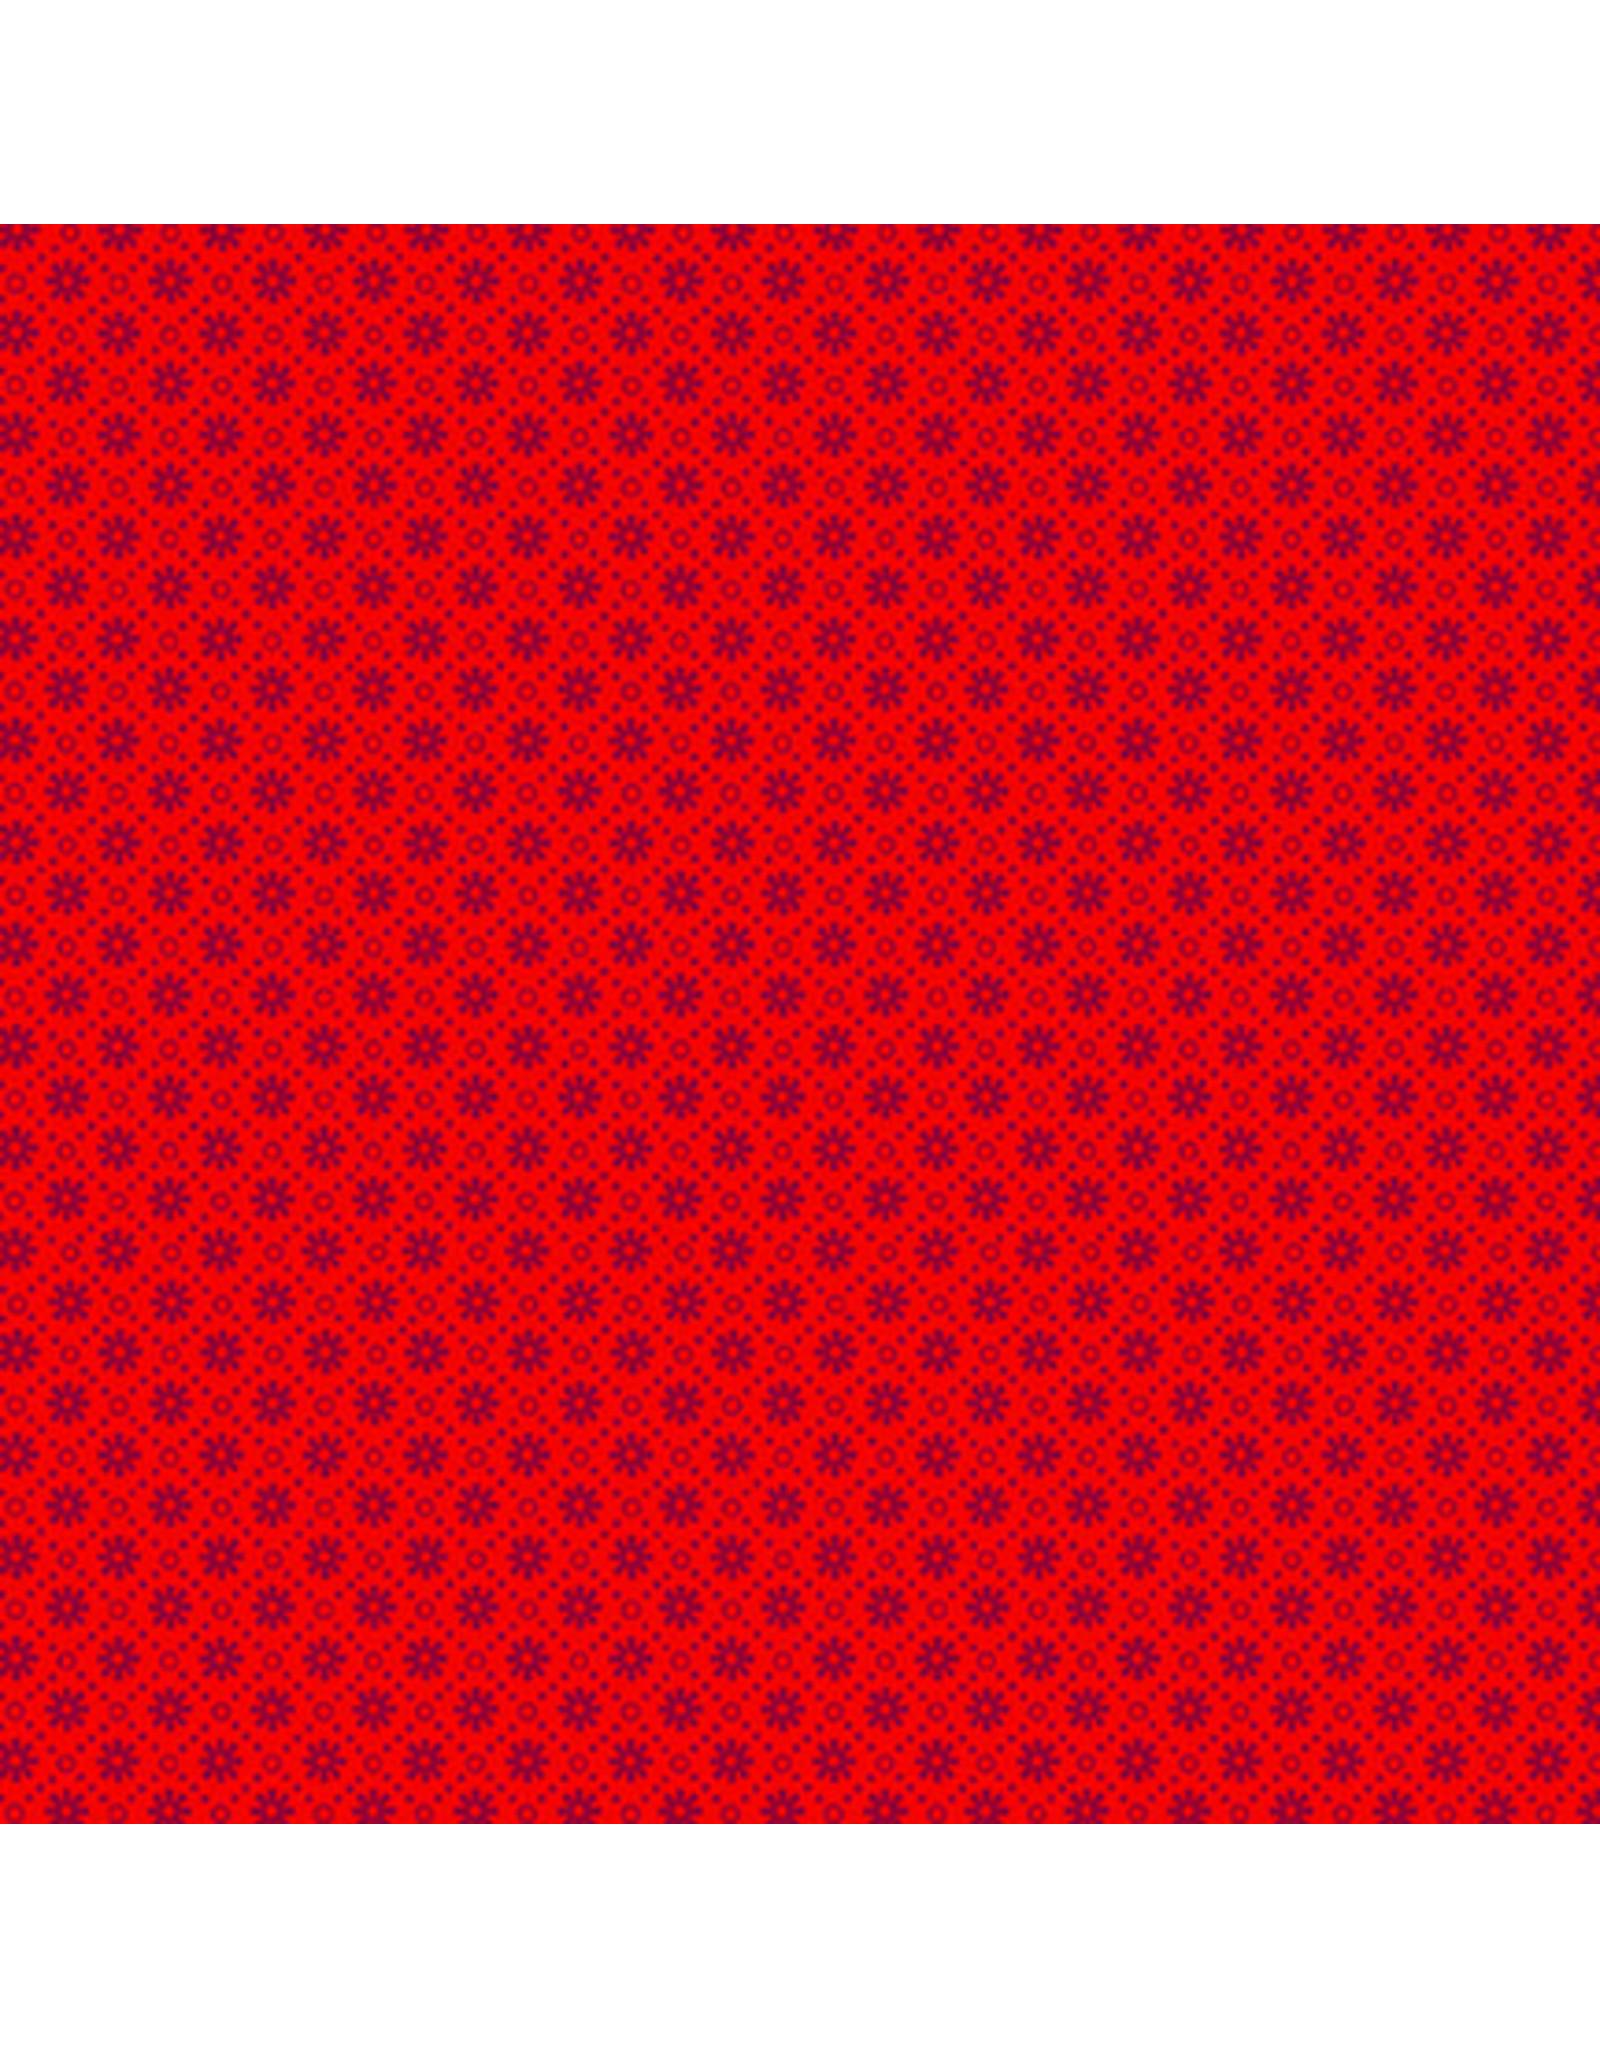 Kanvas Studio Daisy Chain - Red